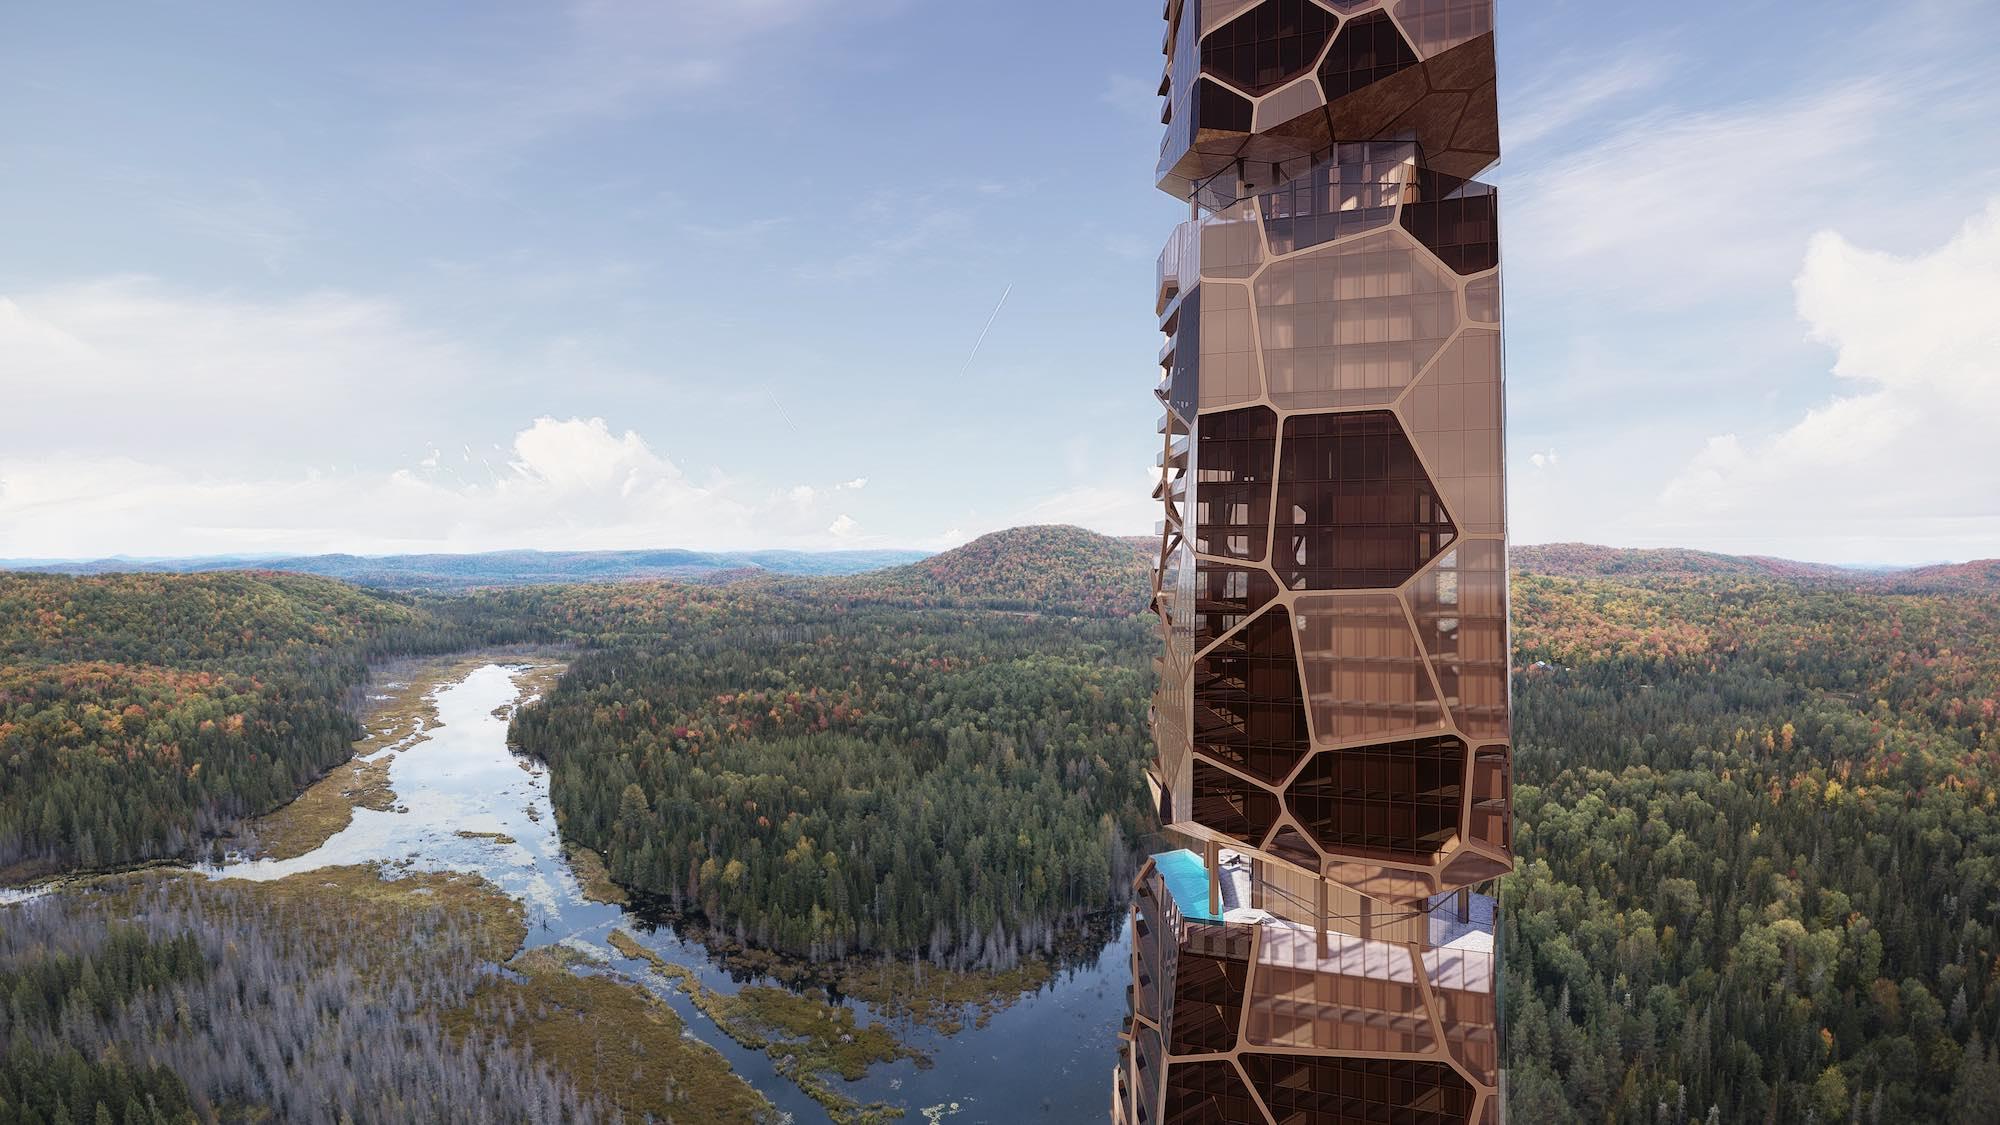 Pekuliari tower in Quebec, Canada designed by MU Architecture